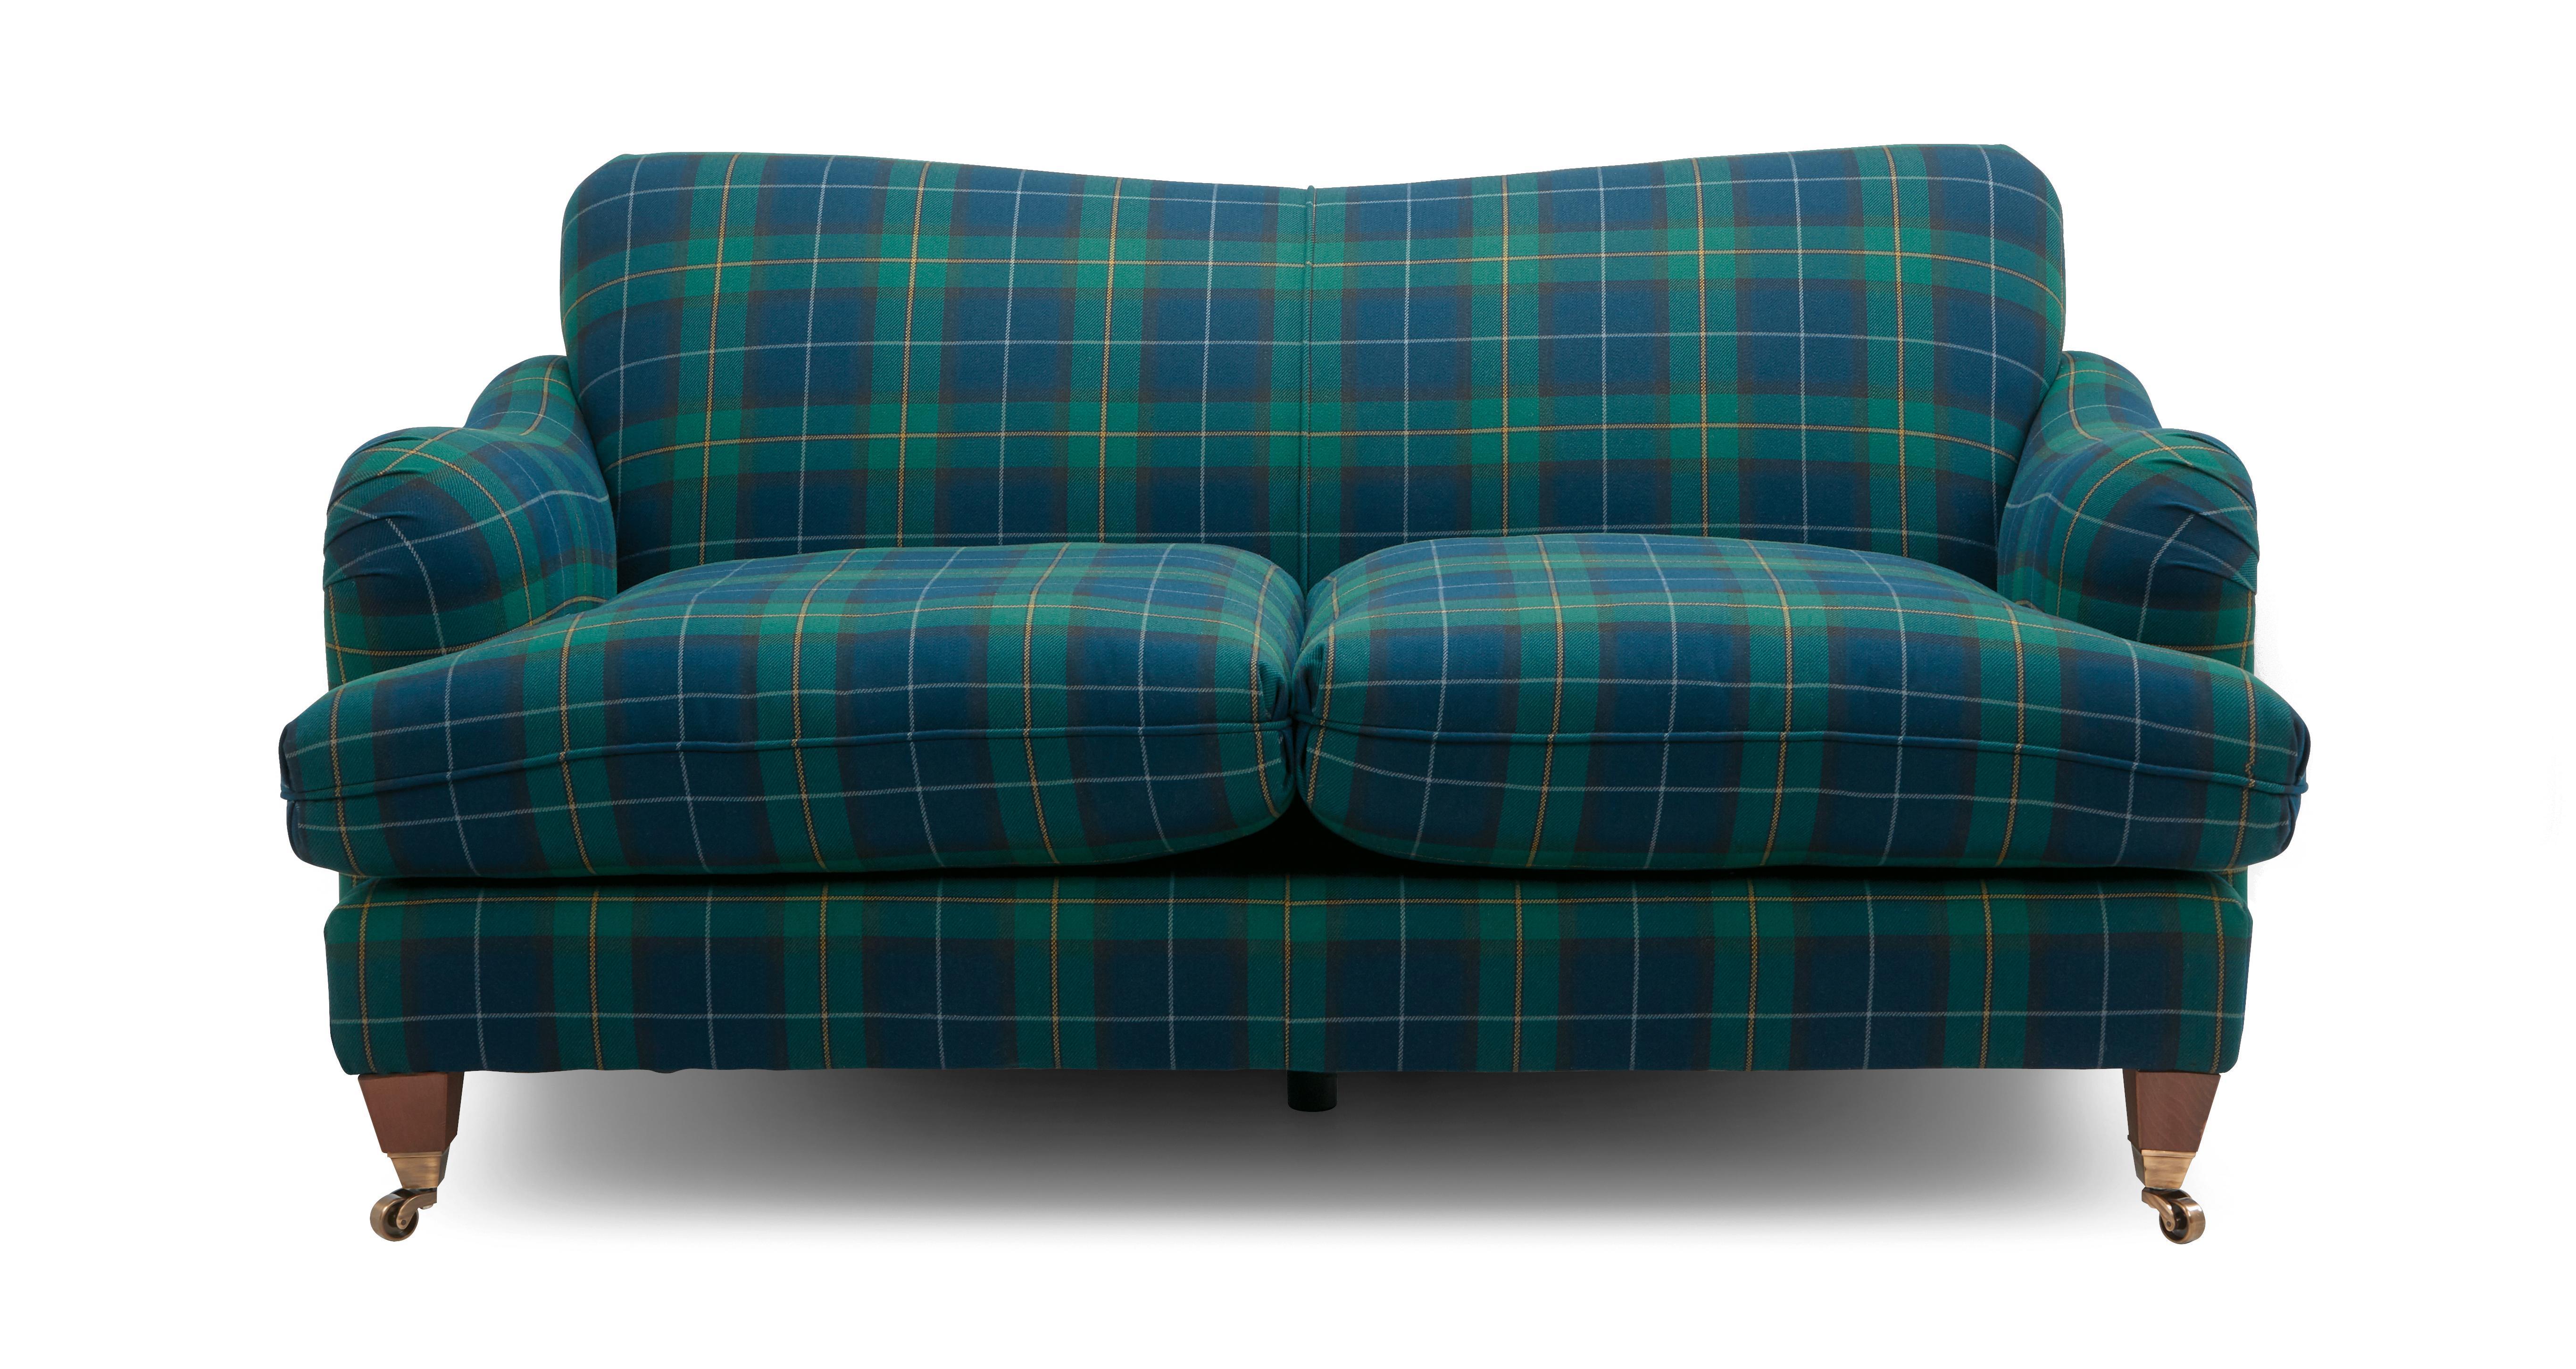 Ilkley Plaid 2 Seater Sofa Ilkley Plaid Dfs